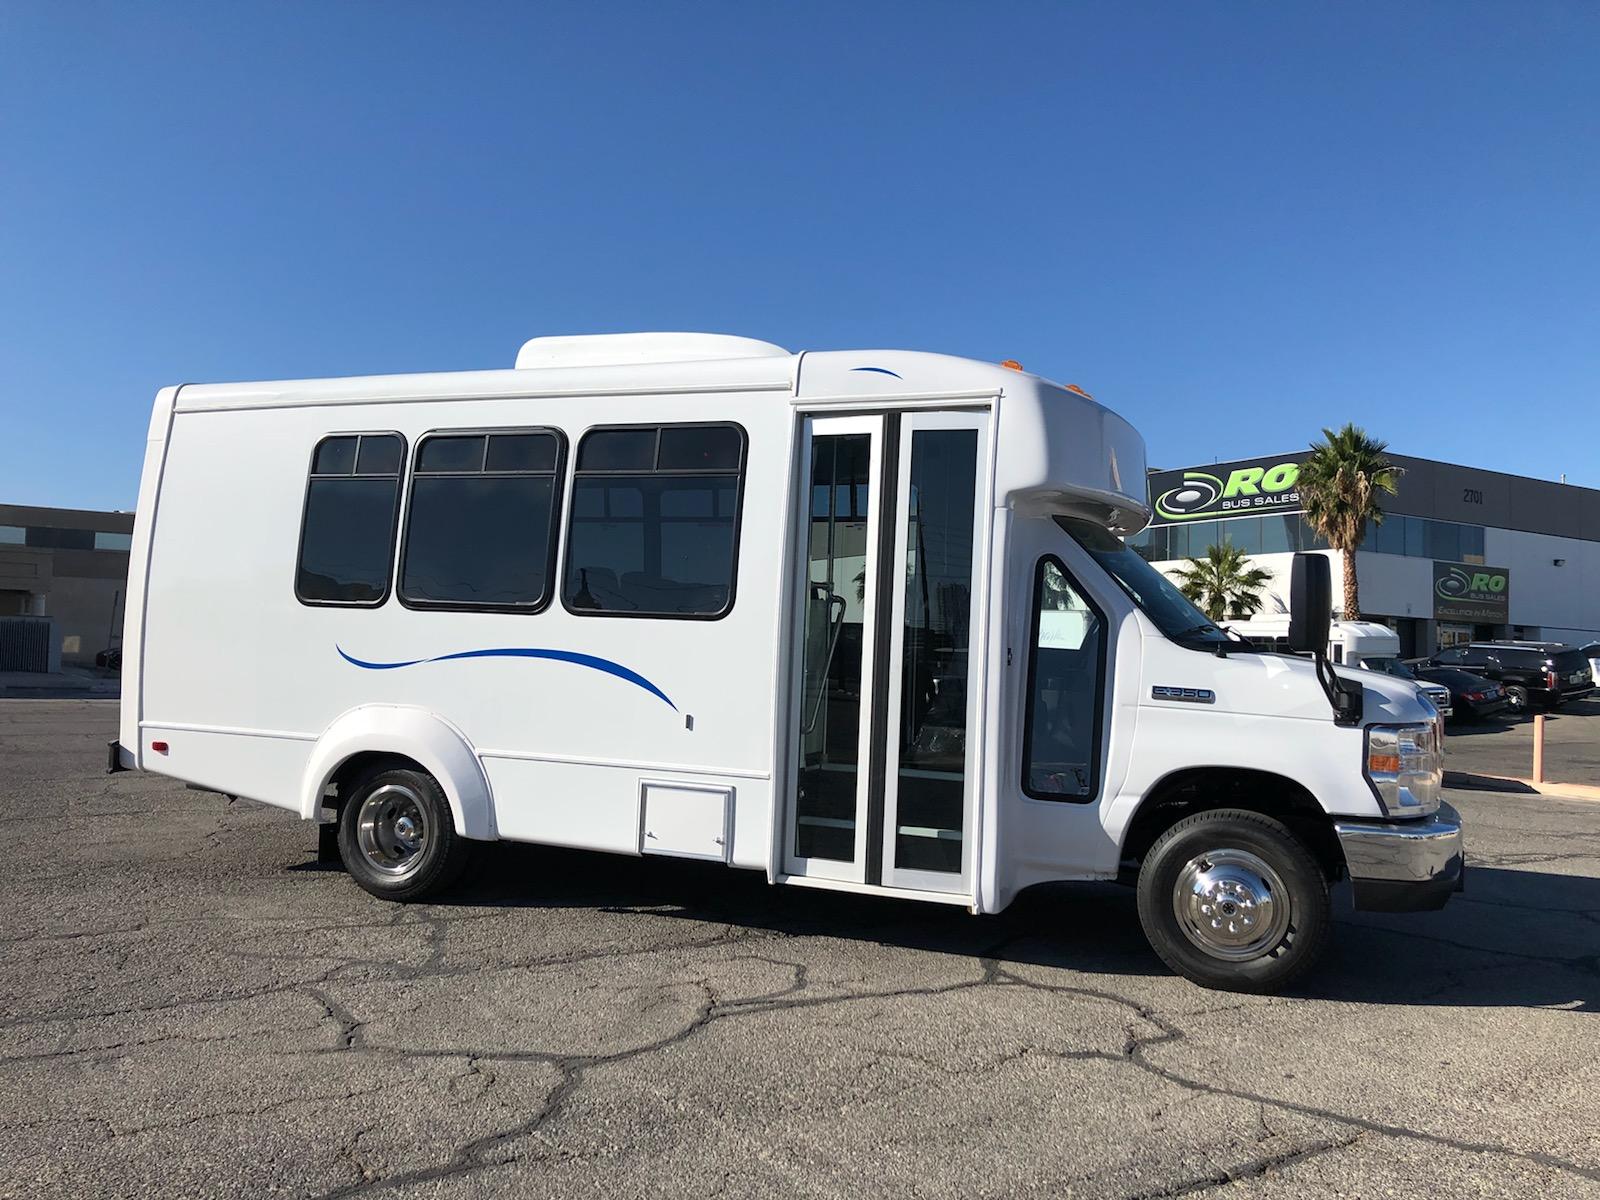 2018 Ford E-350 Elkhart Coach - RO Bus Sales Las Vegas